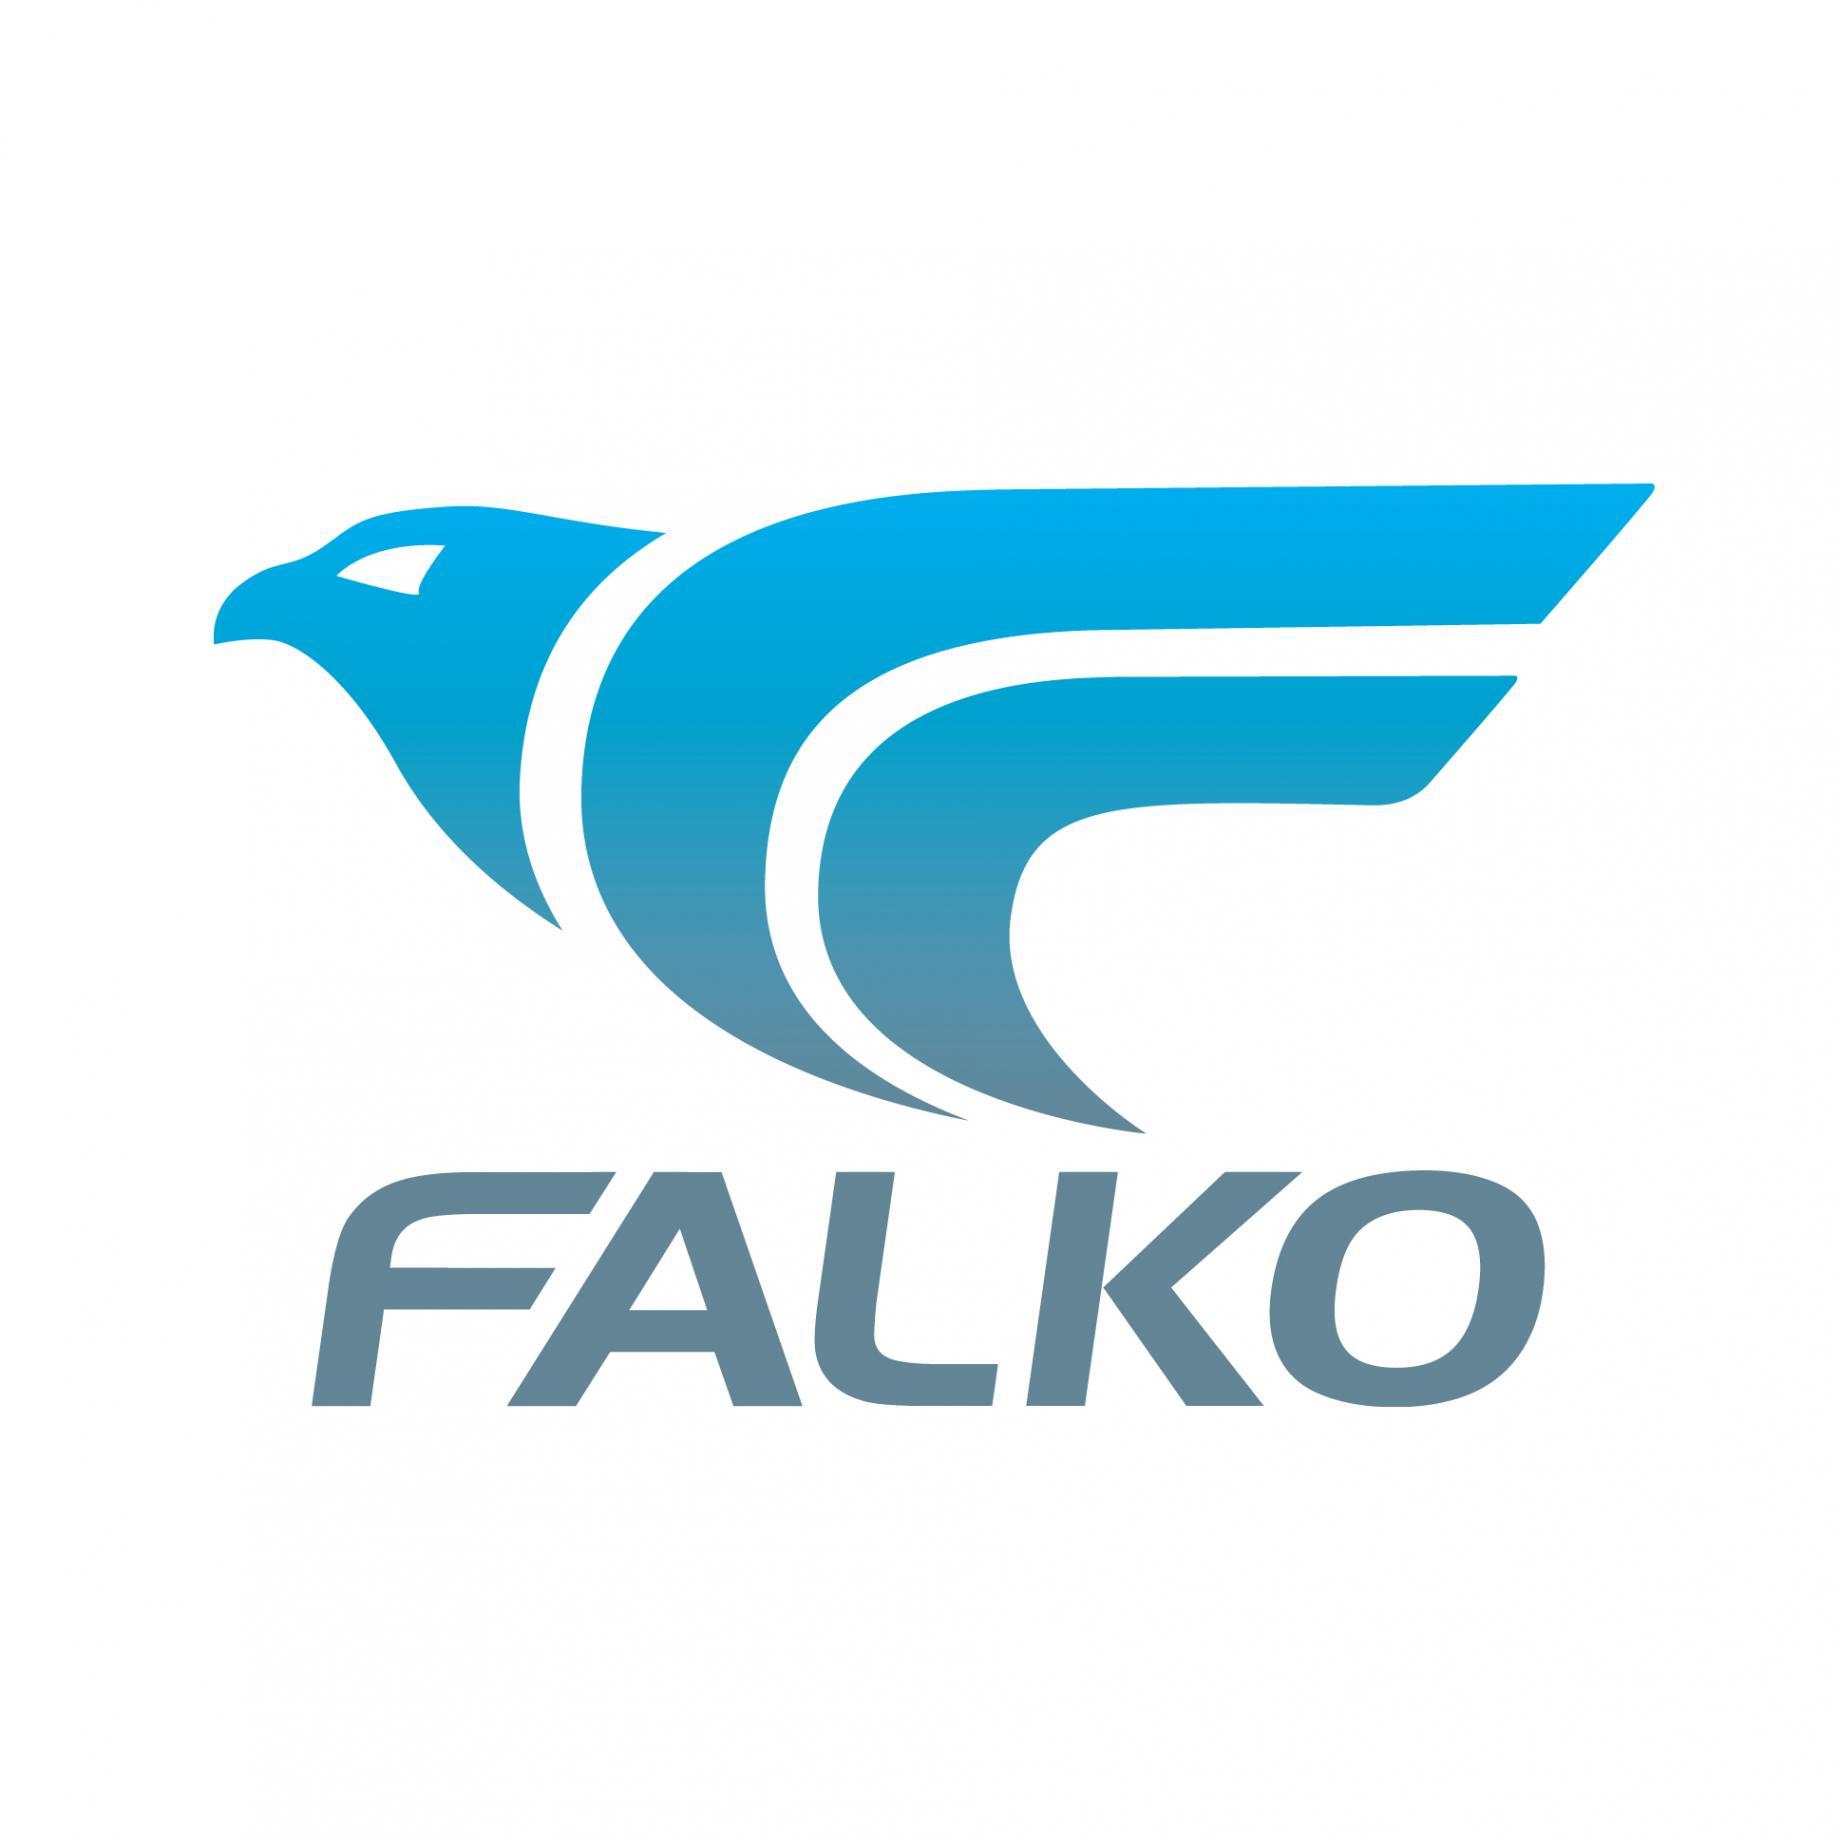 FALKO Golf Logo